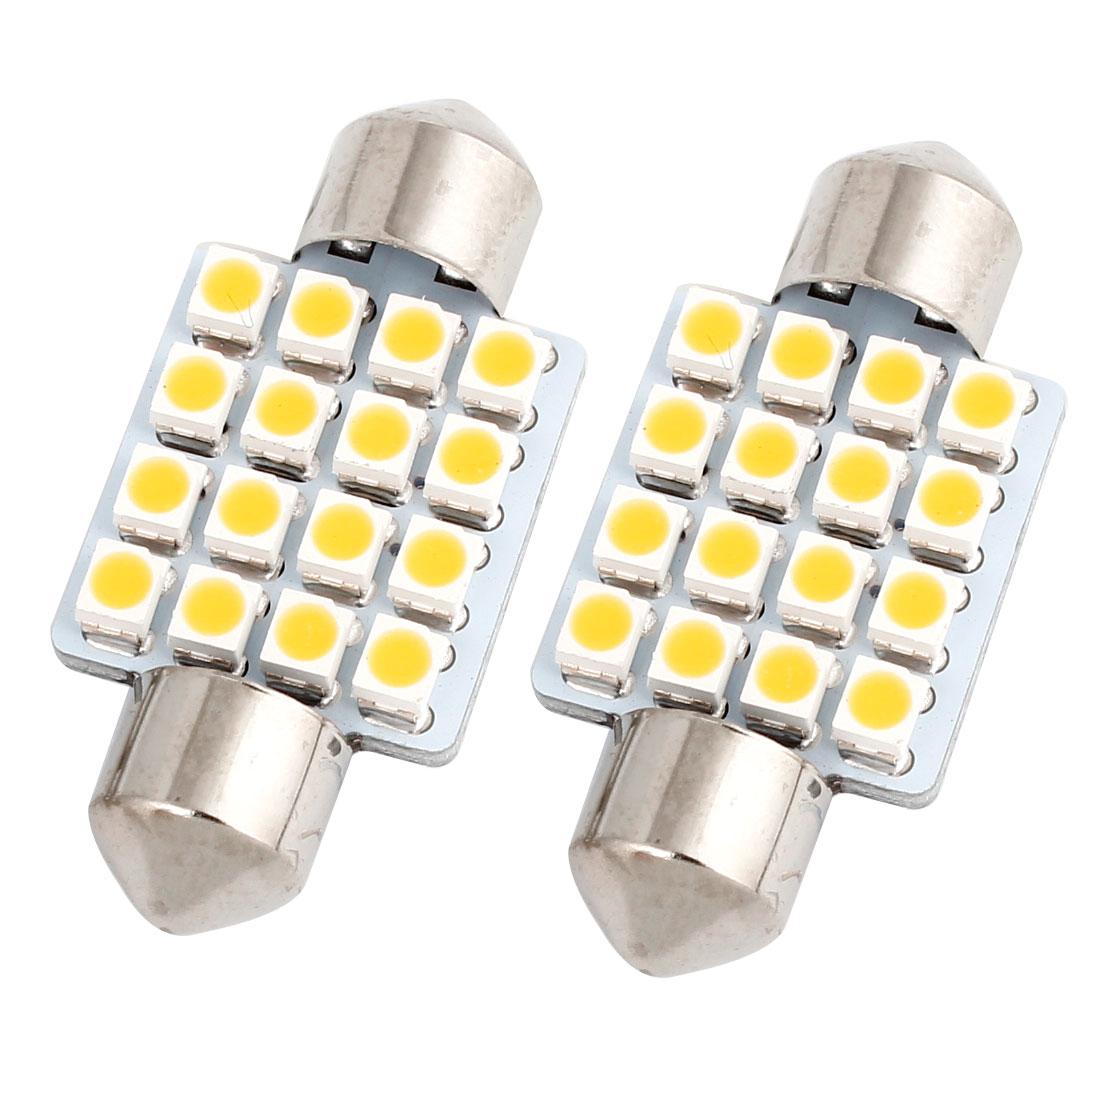 "2PCS 36mm 16-SMD 1.50"" 1210 LED Warm White Festoon Dome Light Lamp 6411 Internal"